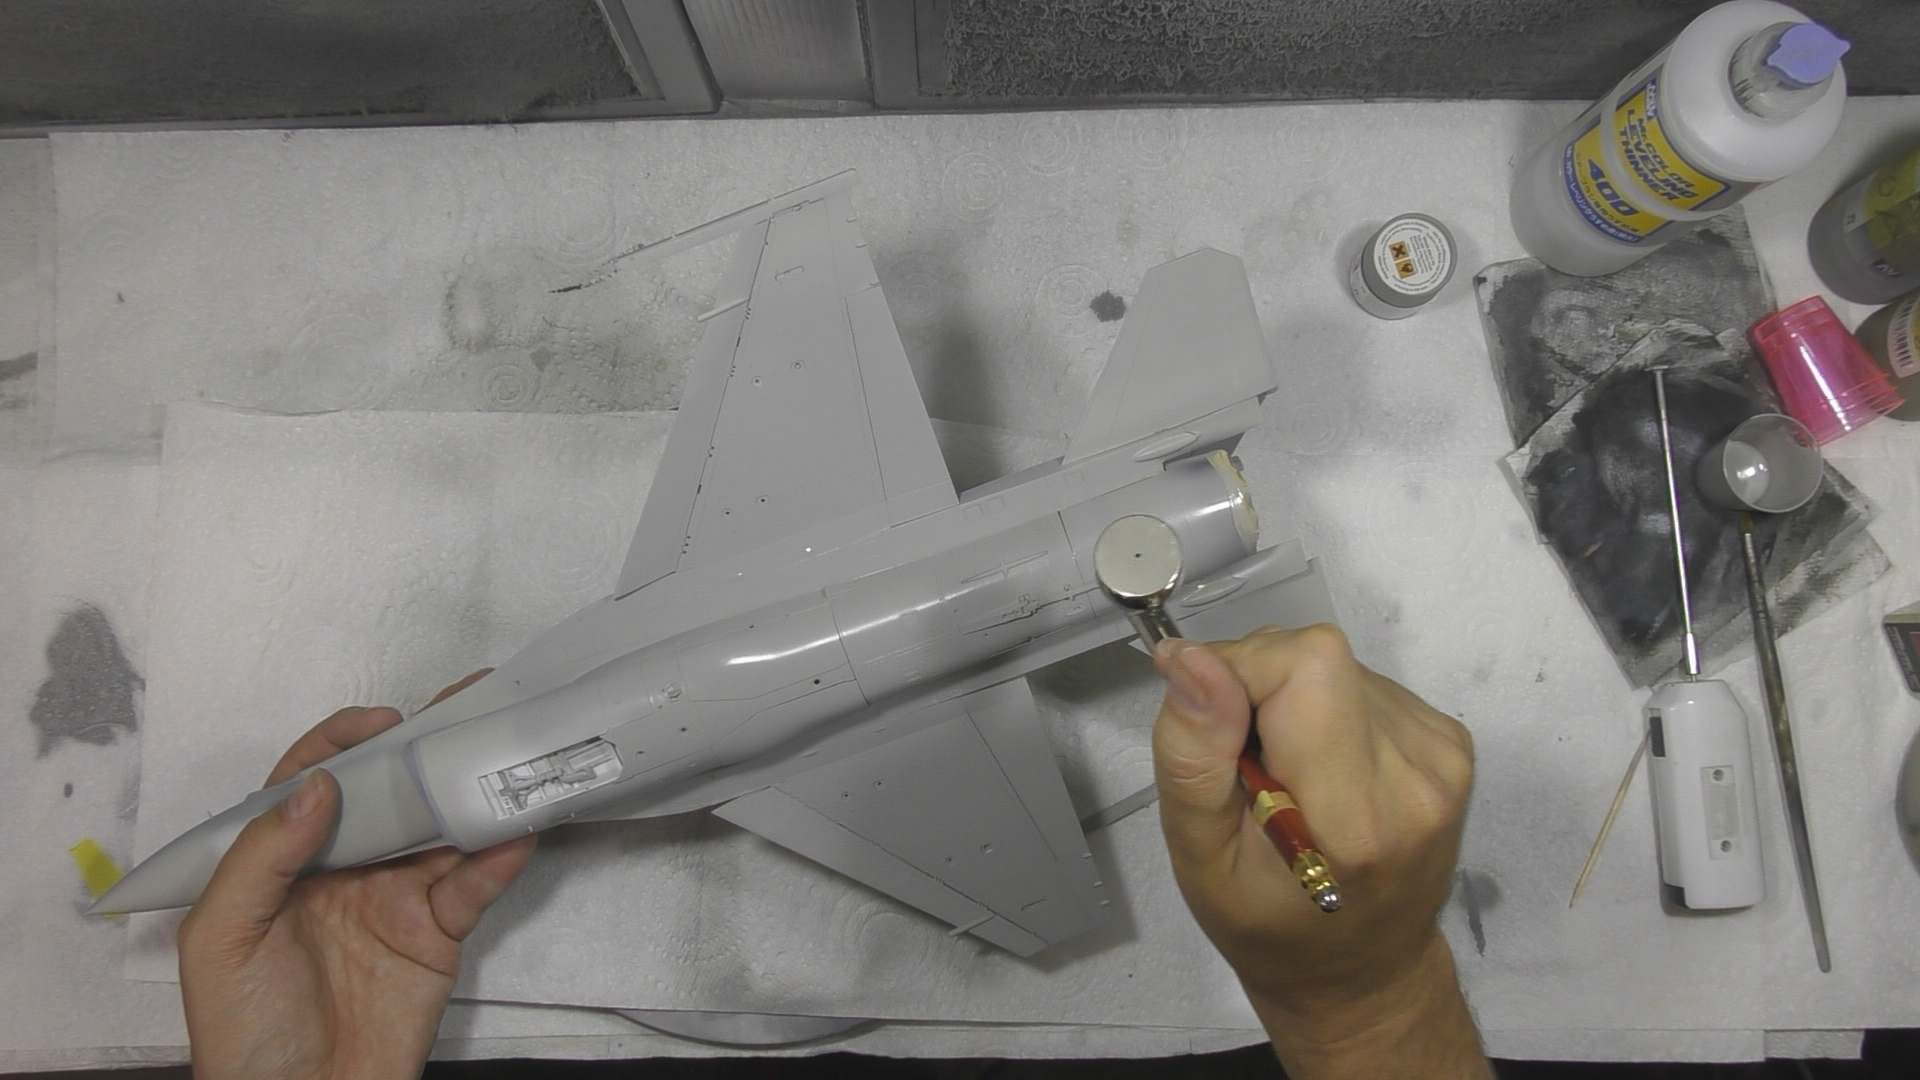 Tamiya F16 Part 9 Pic 1.jpg